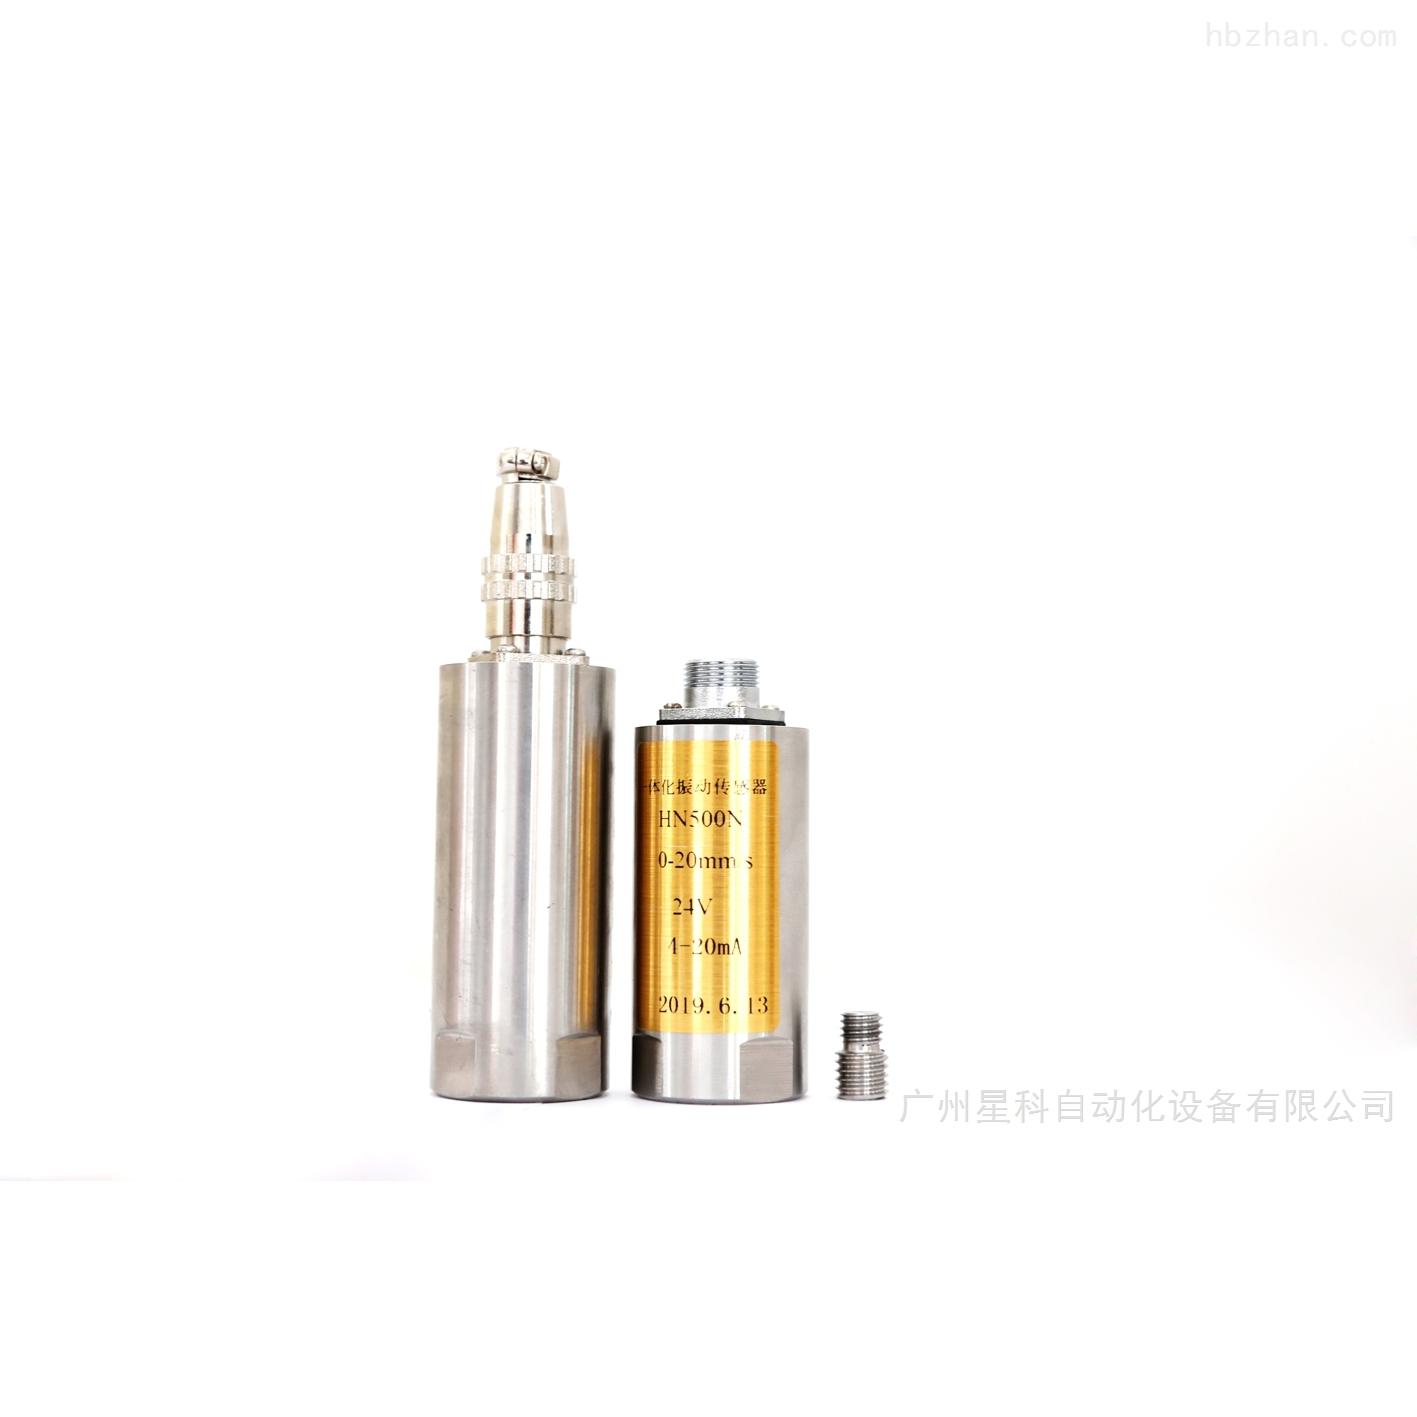 ST-2振动速度传感器、测振探头